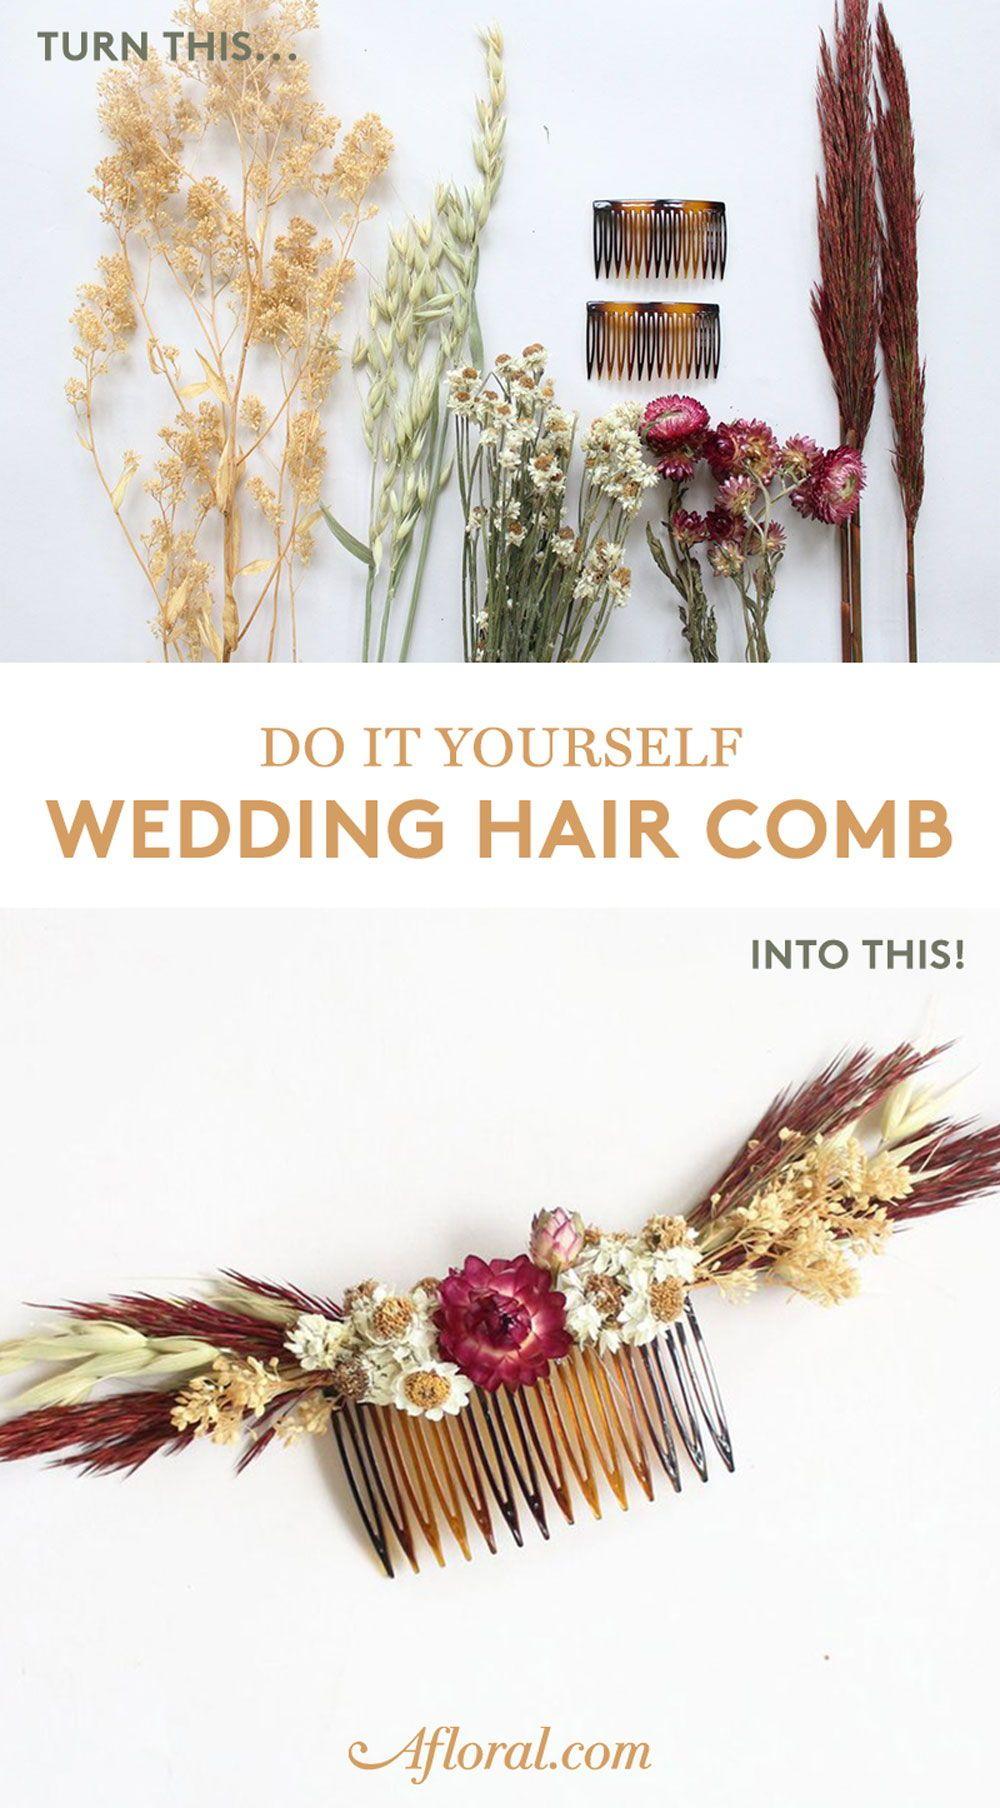 diy wedding hair comb with dried flowers | diy wedding in